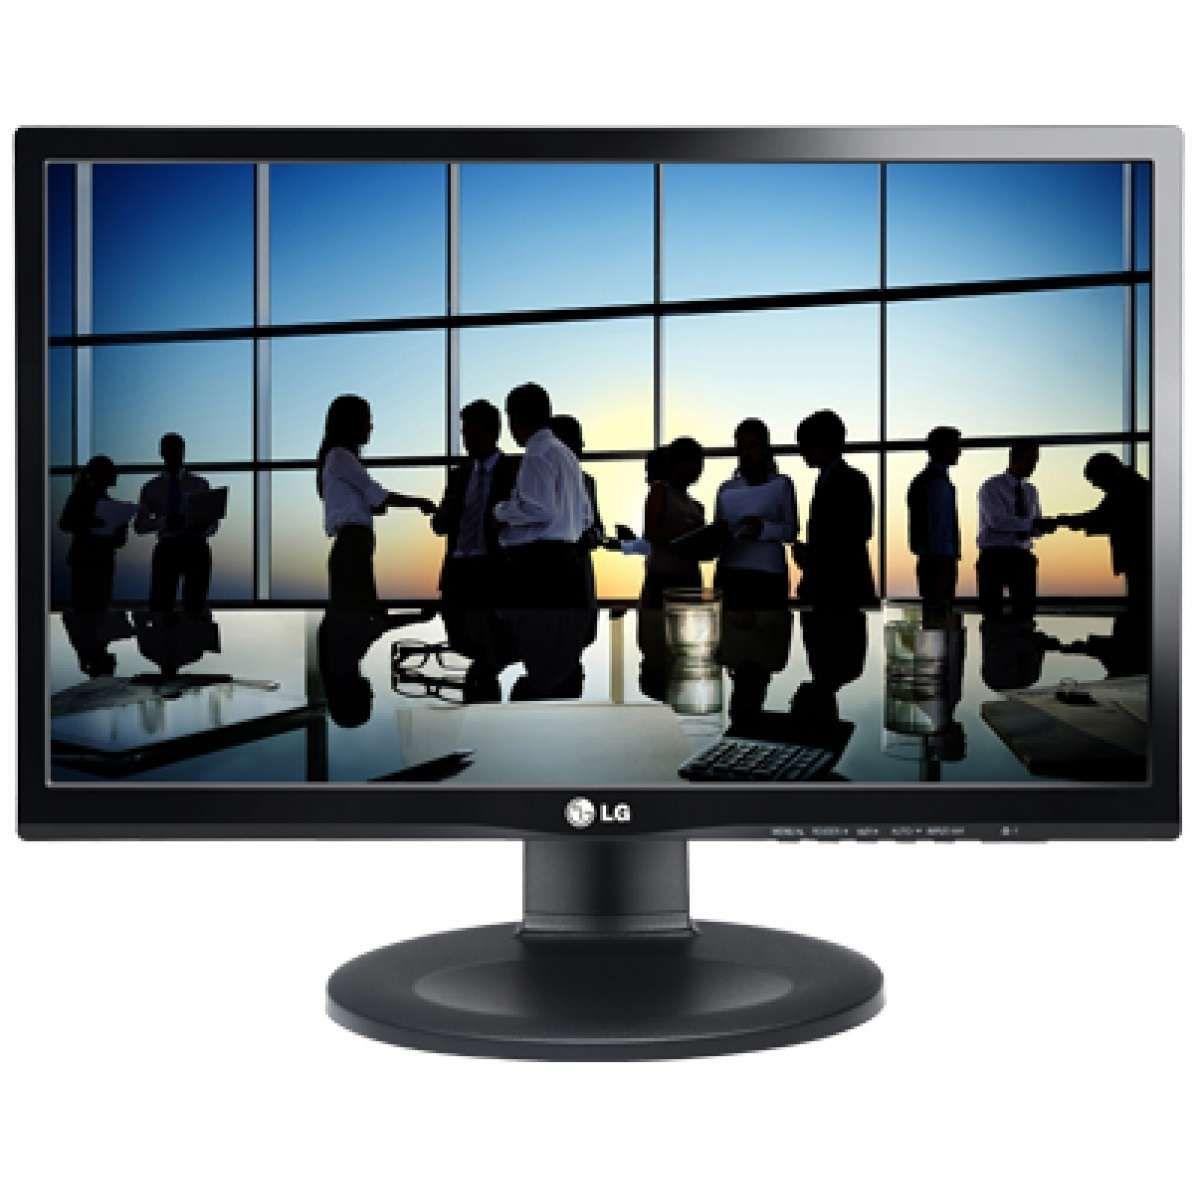 Monitor LG LED 21,5 IPS Full HD, Ajuste de Altura HDMI, DVI 22MP55PQ-B